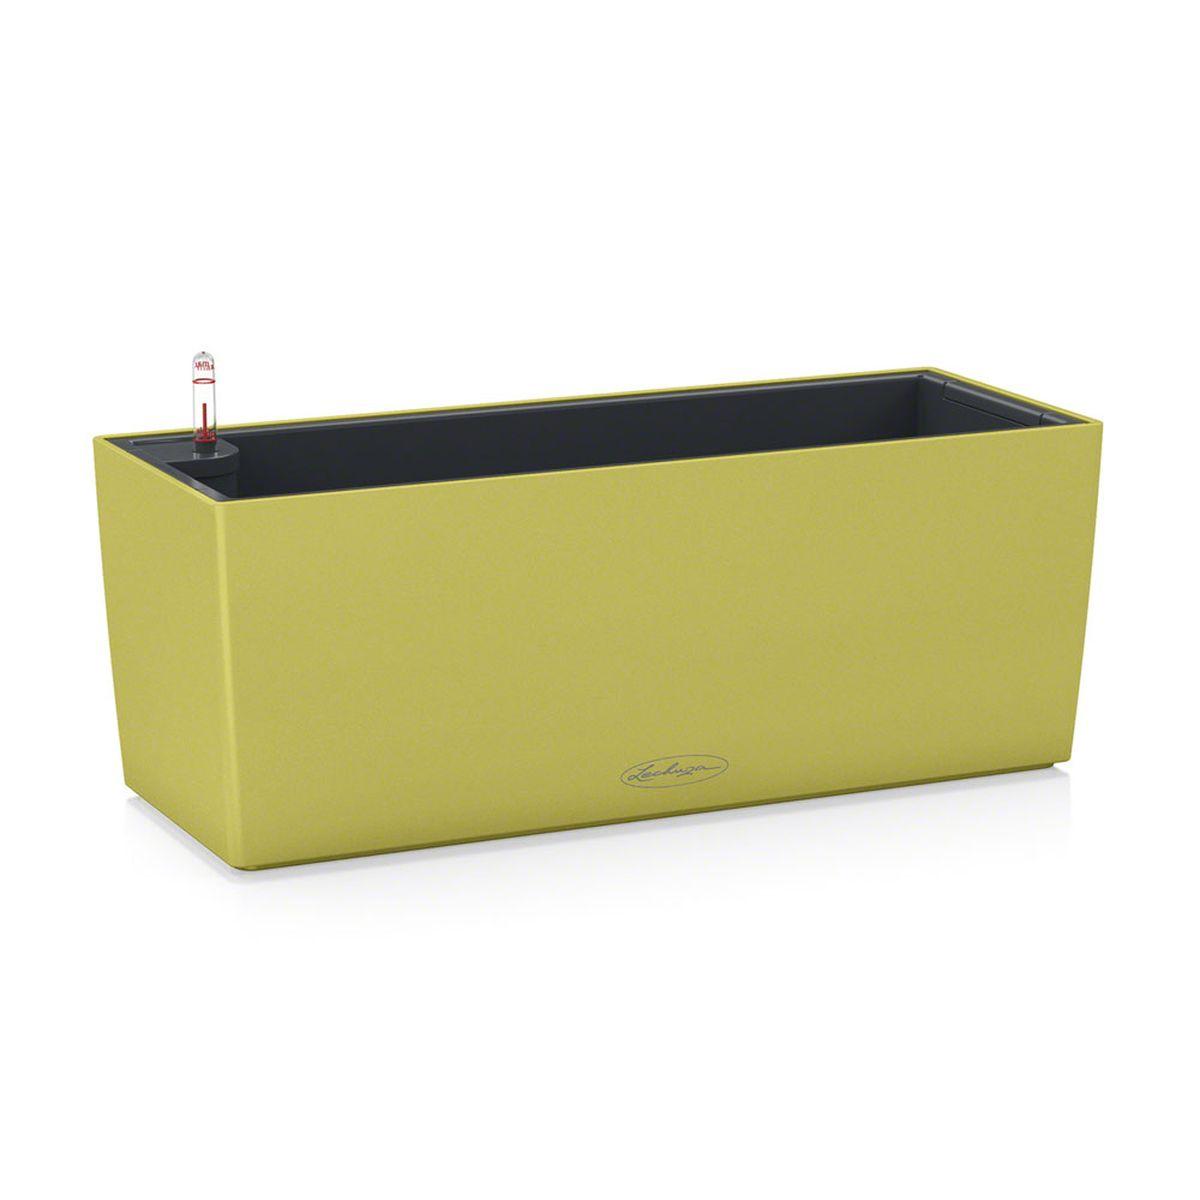 "Кашпо Lechuza ""Balconera Color"", с системой автополива, цвет: фисташковый, 50 х 19 х 19 см"